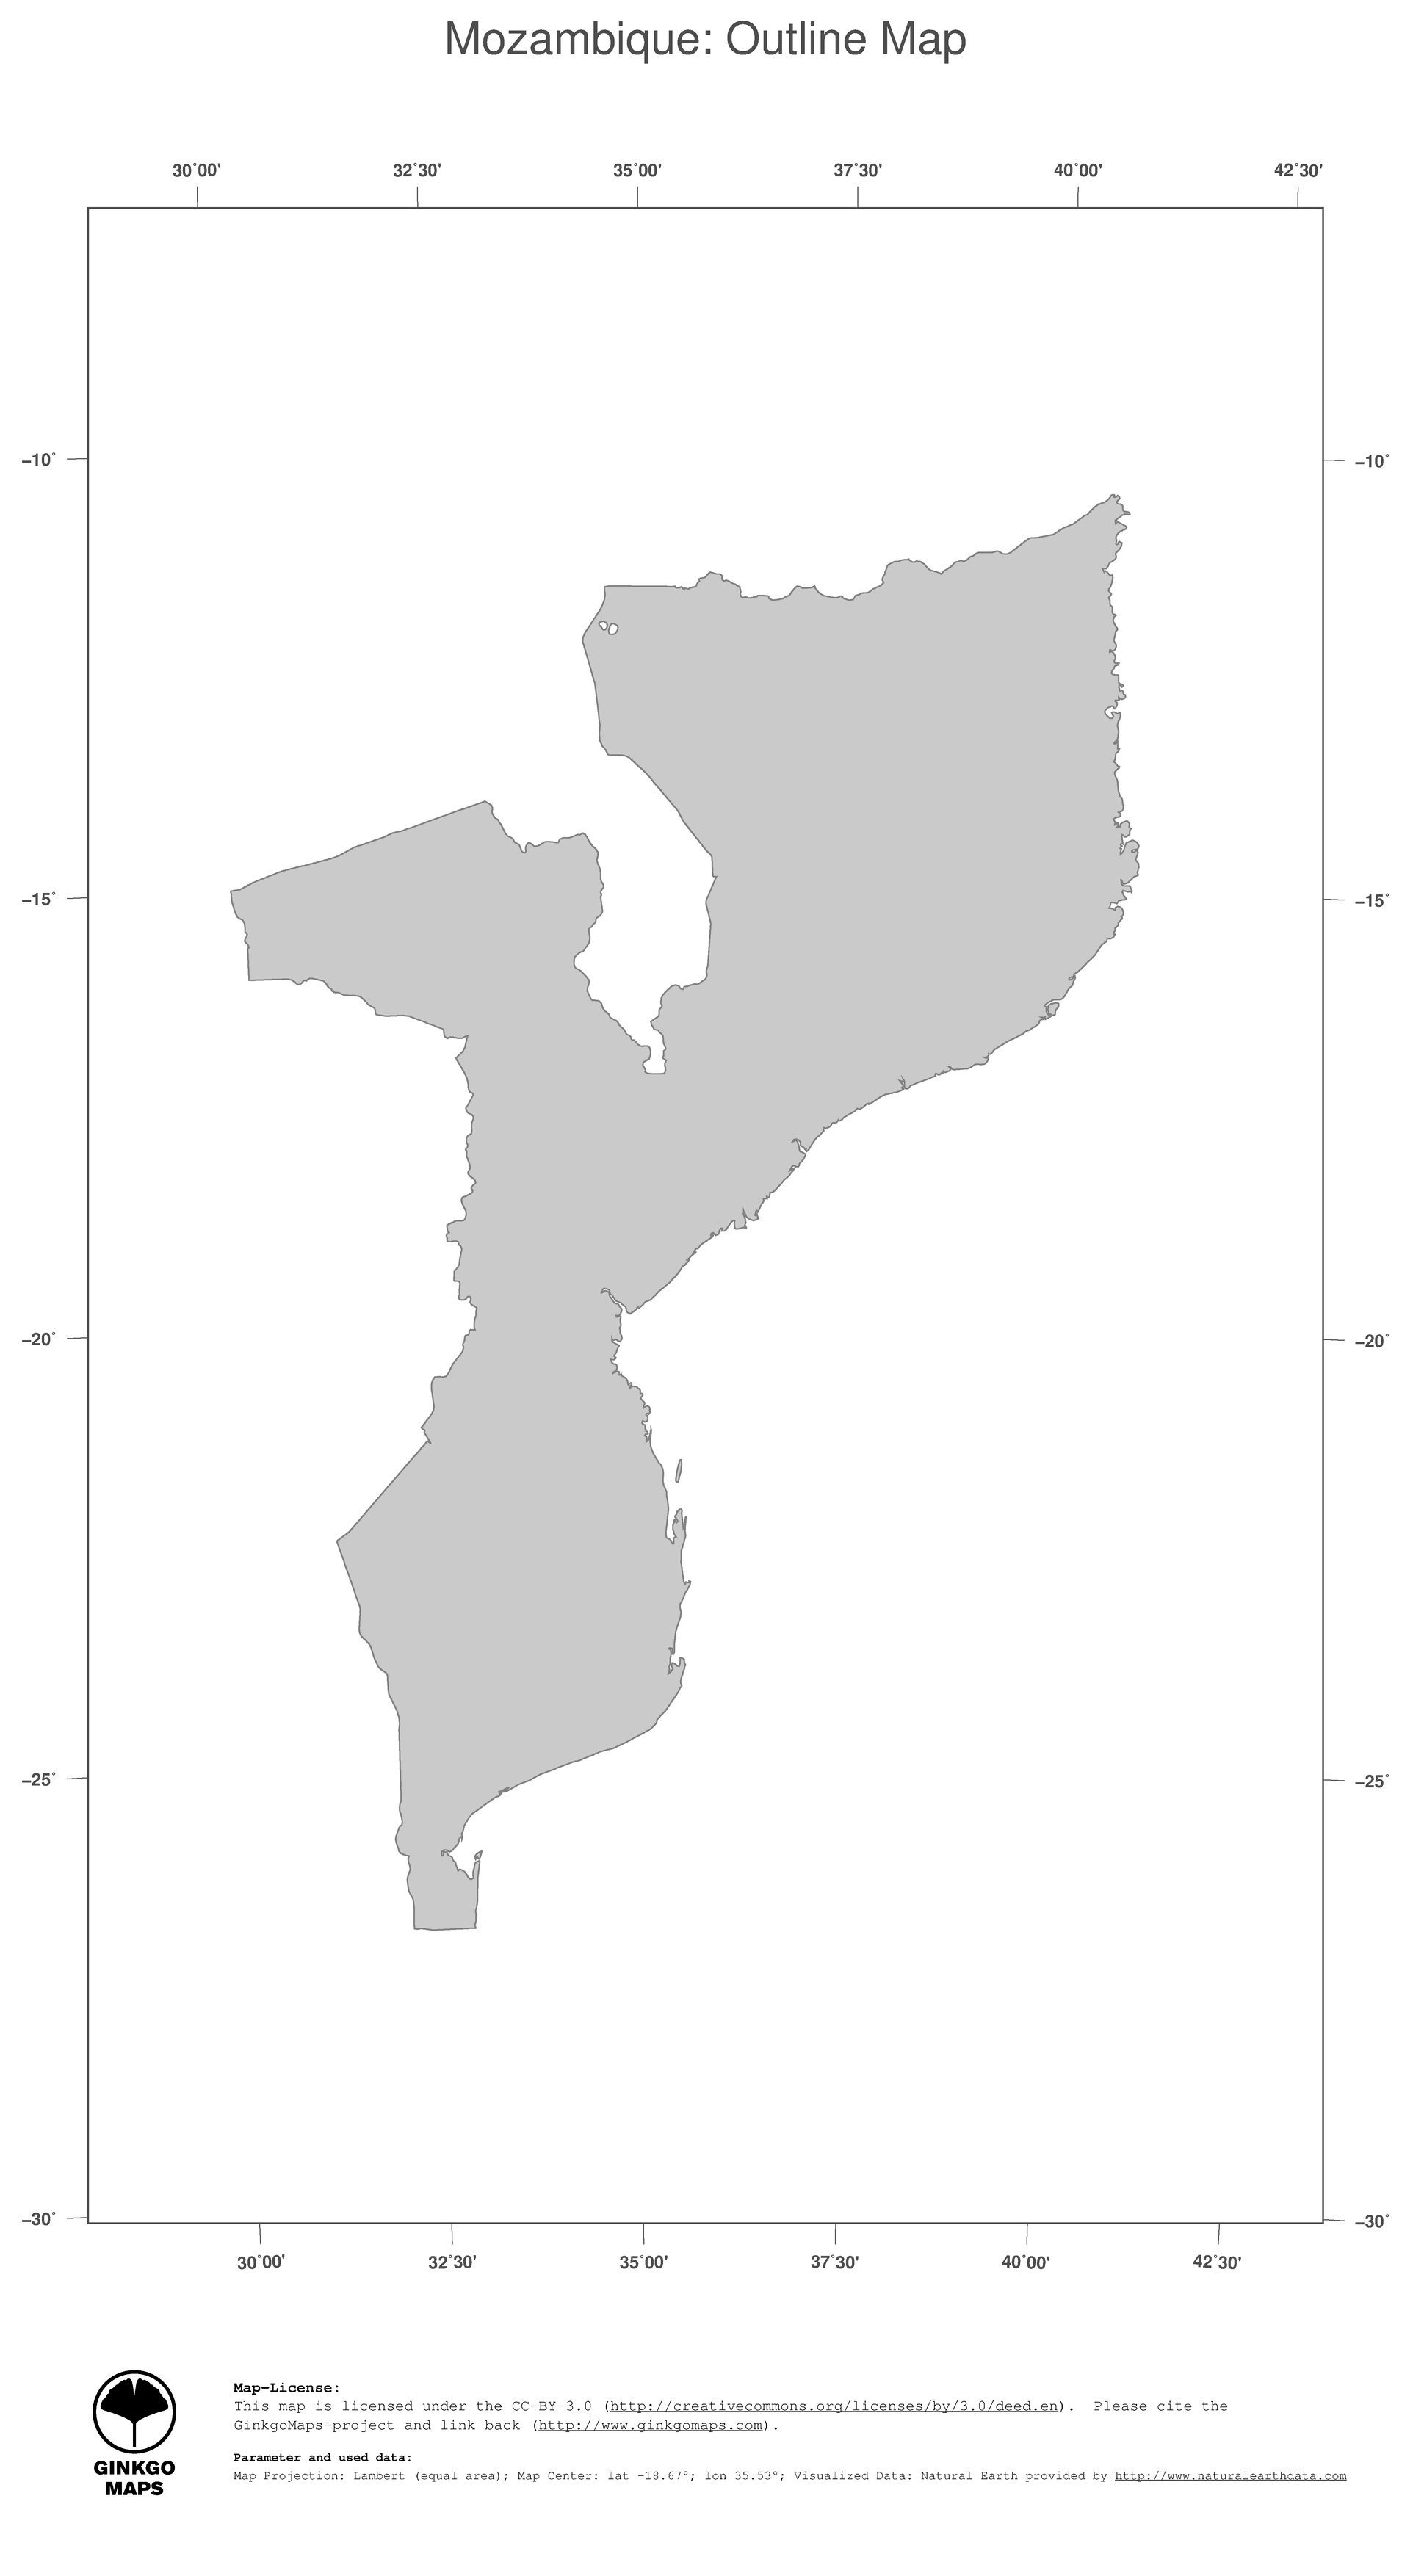 Map Mozambique GinkgoMaps continent Africa region Mozambique